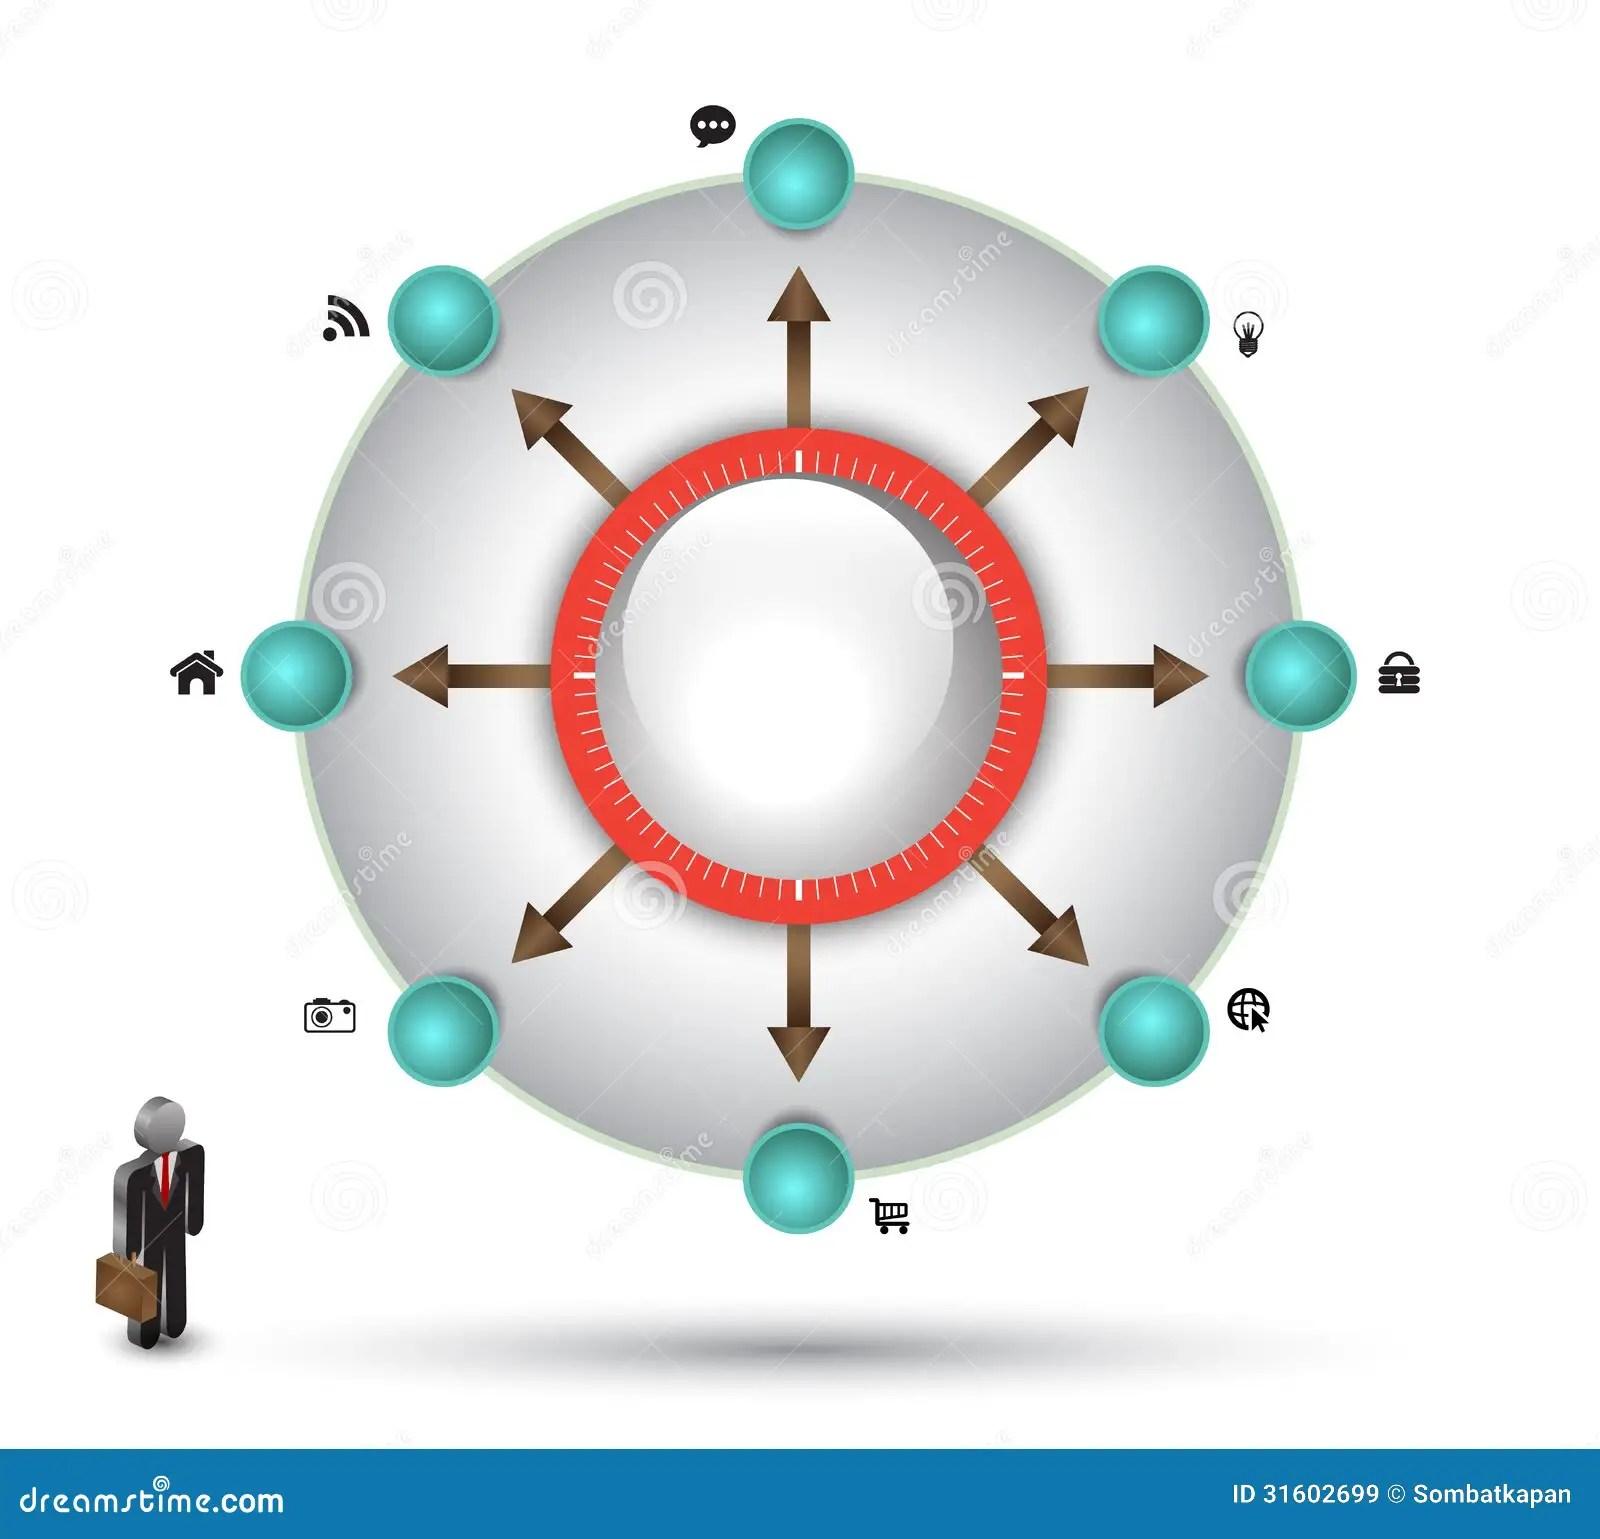 free circular arrow diagram template 3d origami pokeball circle vector with icon royalty